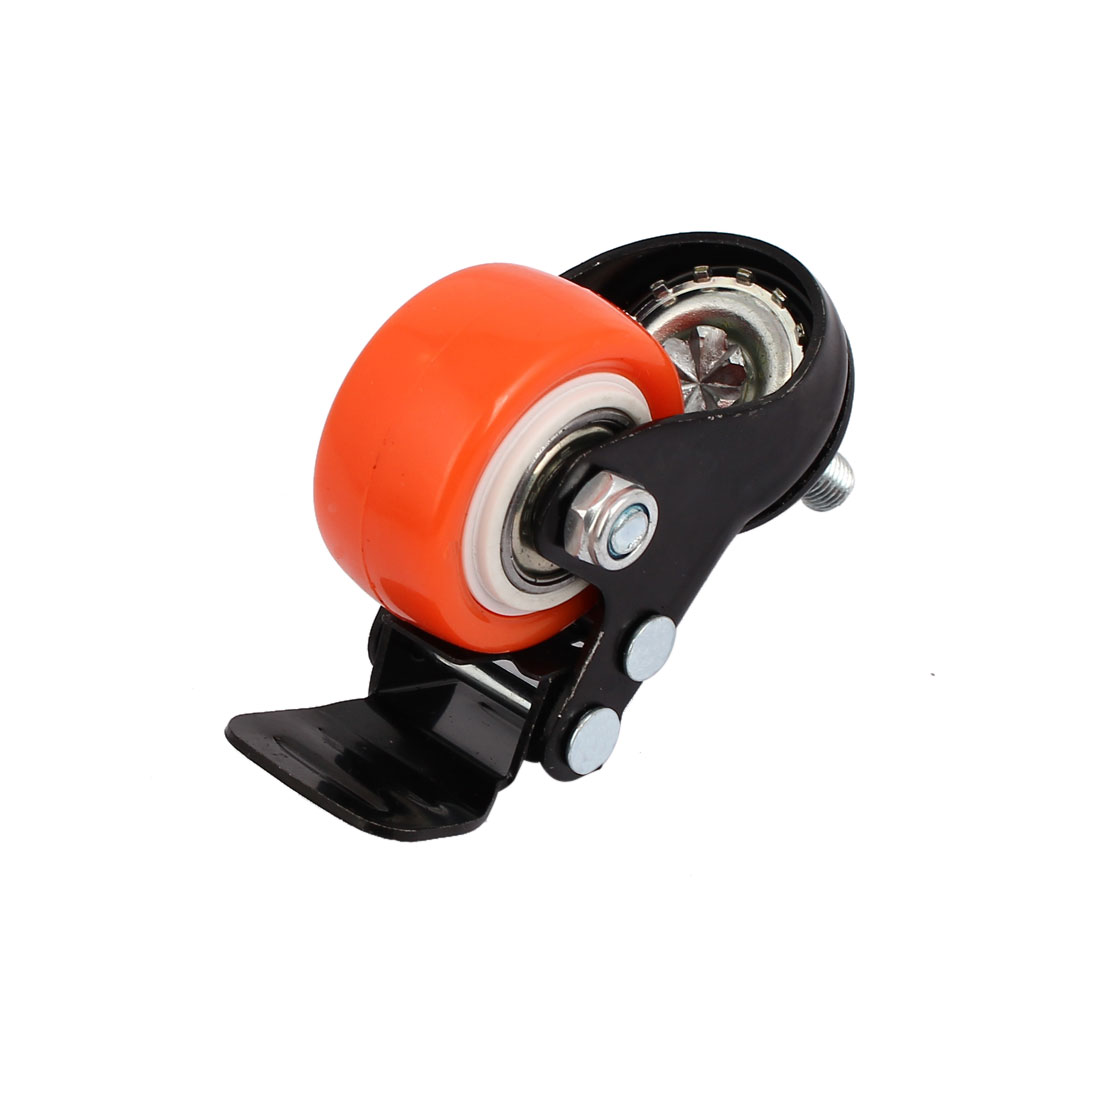 "1.5"" Round Single Wheel 8mm Thread Dia Caster Wheel w Brake Orange 2pcs - image 2 of 3"